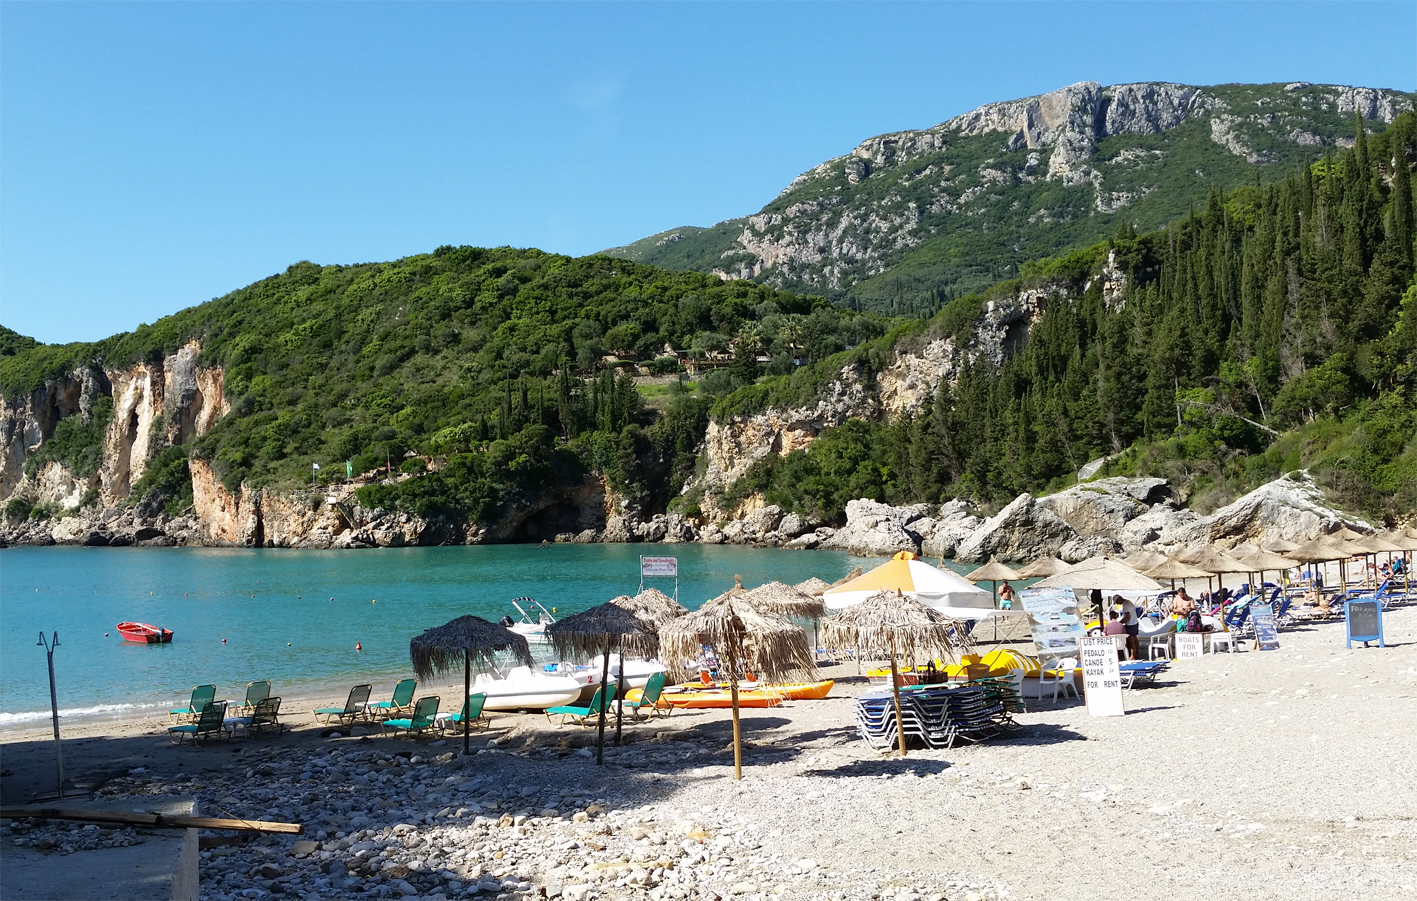 Blue Princess Beach Resort A Room With View In Corfu Greece Food